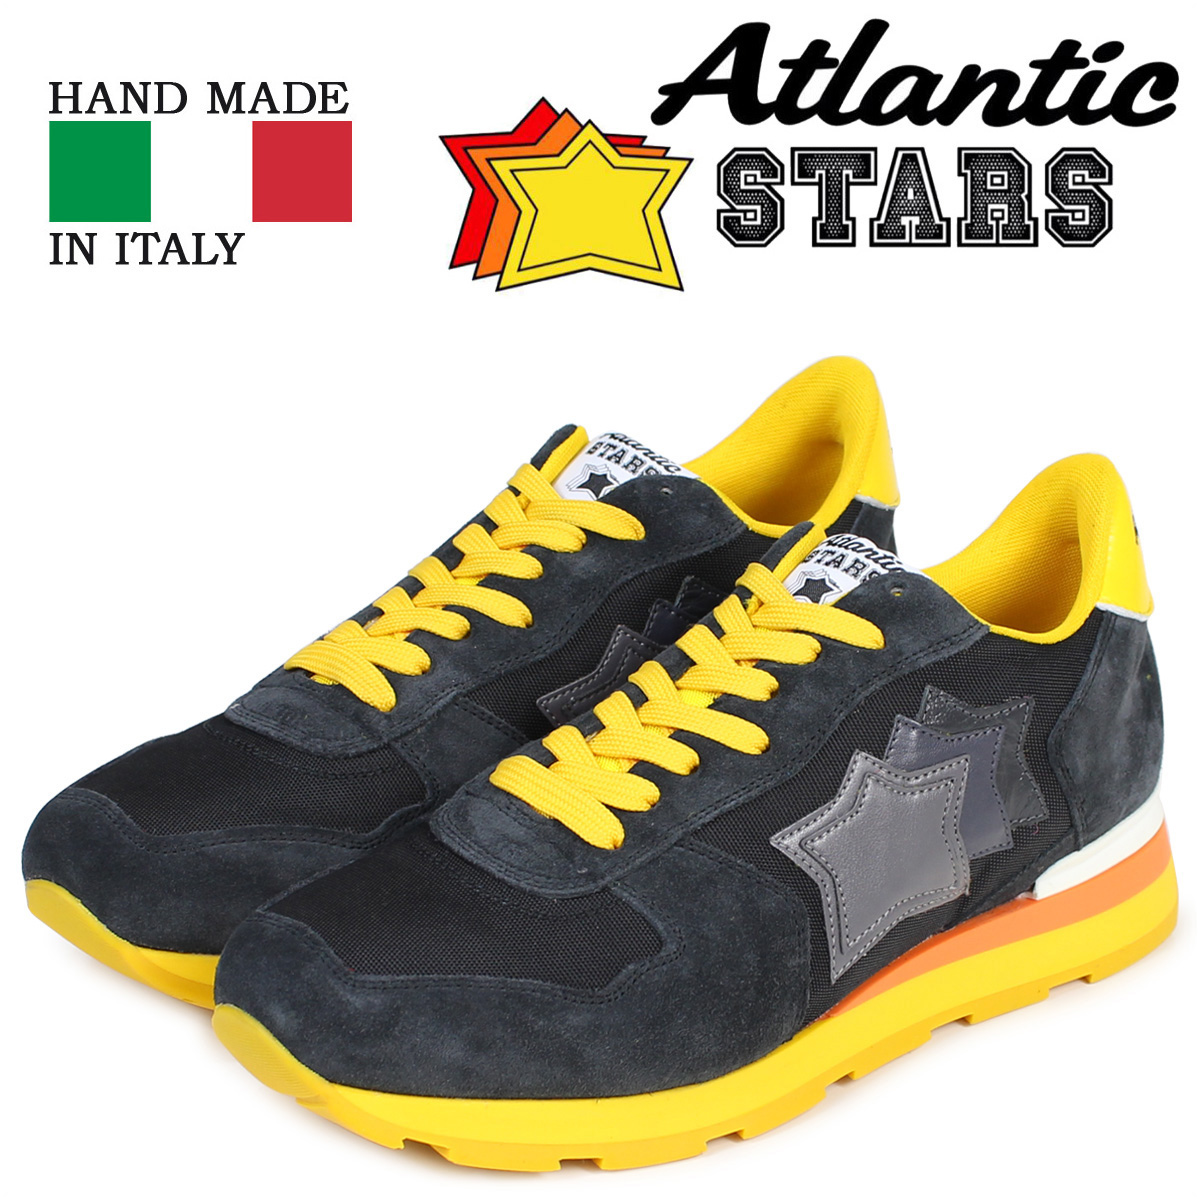 Atlantic STARS メンズ スニーカー アトランティックスターズ アンタレス ANTARES SB-46B 靴 ブラック 黒